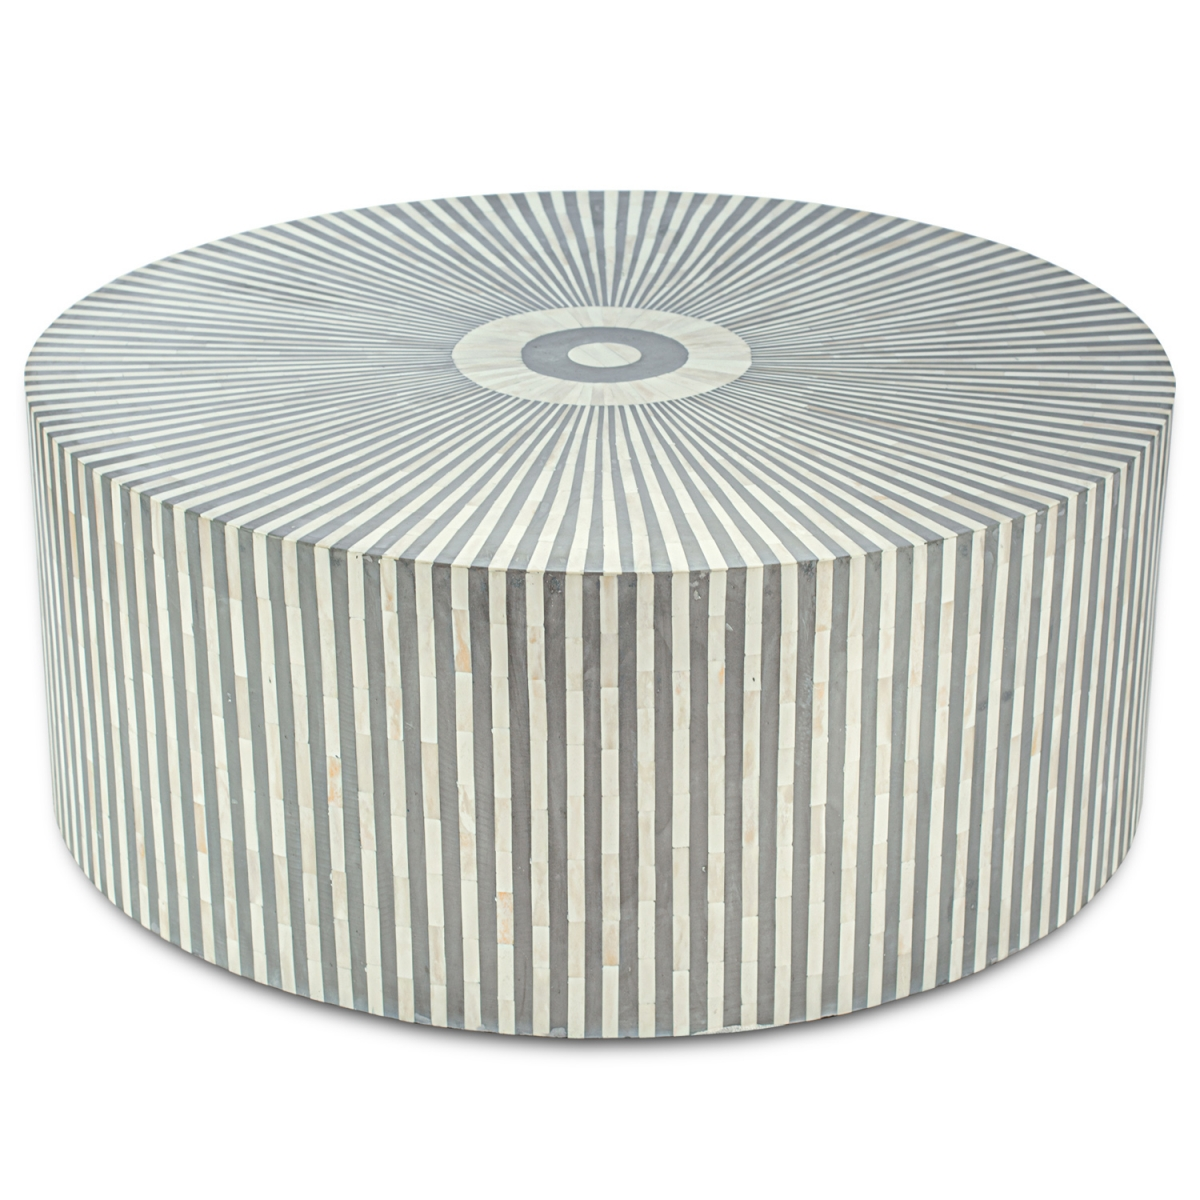 Стол кофейный отделка перламутр BONE INLAY COFFEE TABLE Grey Stripe  - фото 1